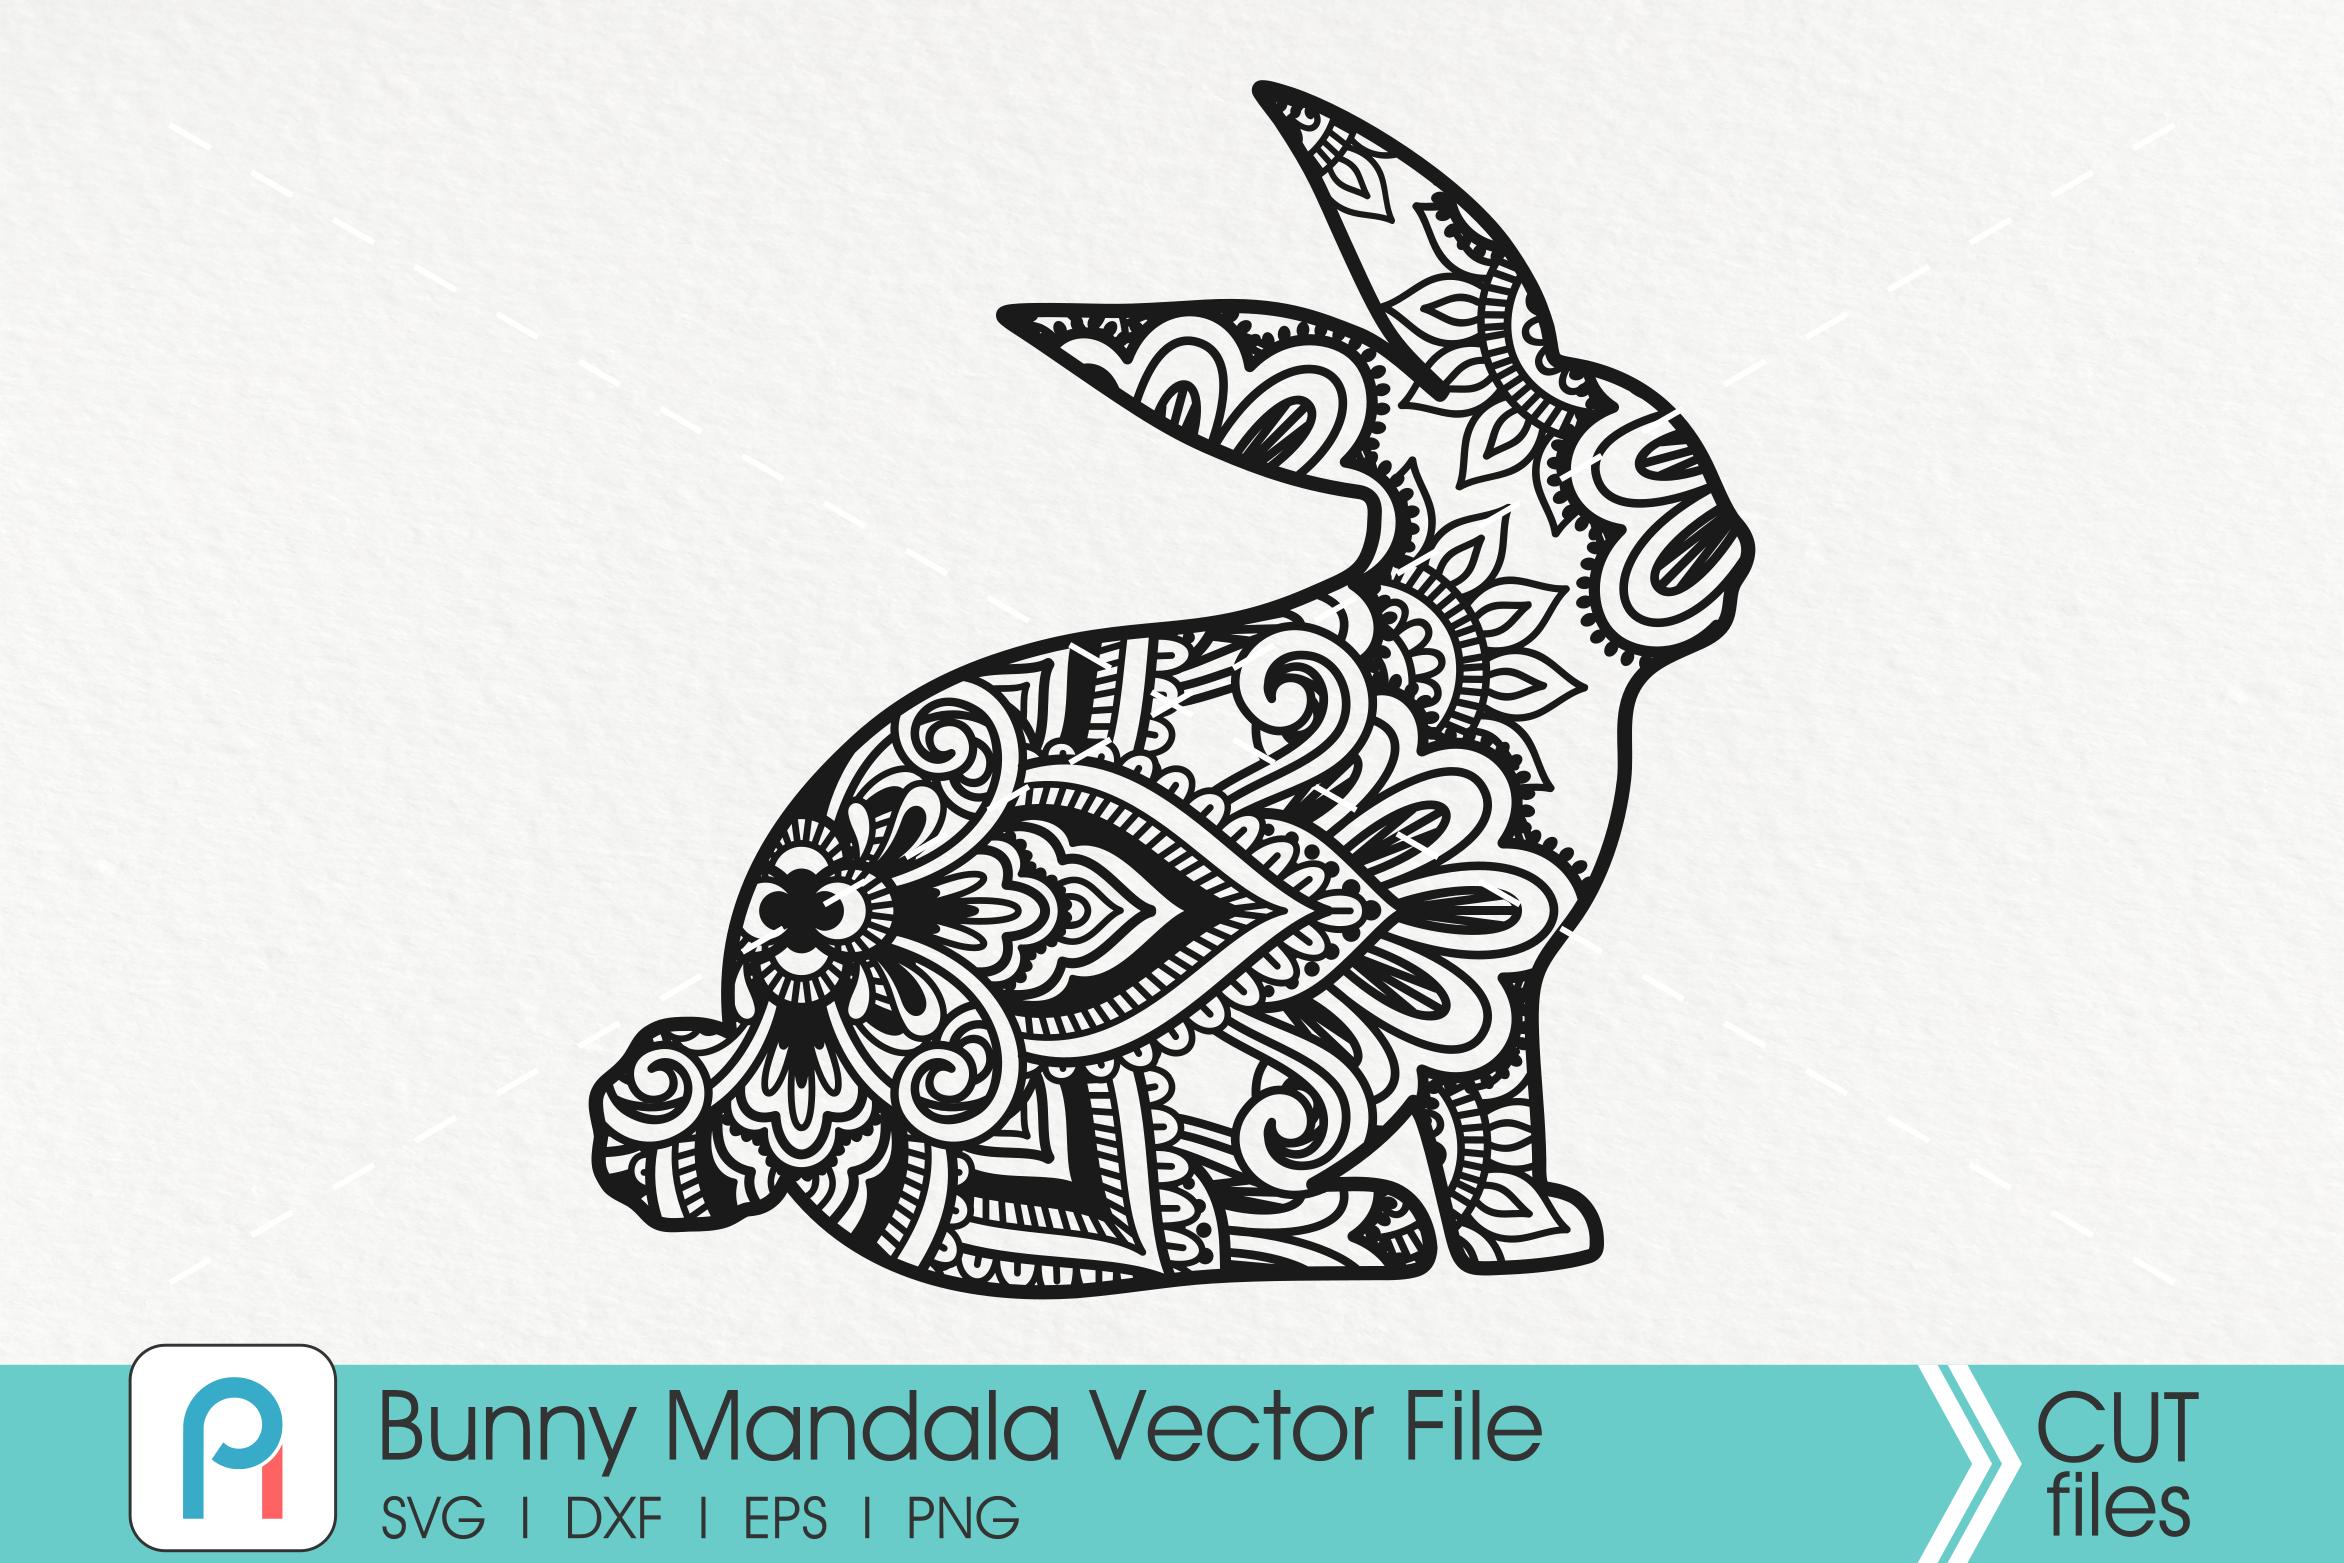 Bunny Svg, Bunny Mandala Svg, Easter Bunny Svg, Easter Svg example image 1